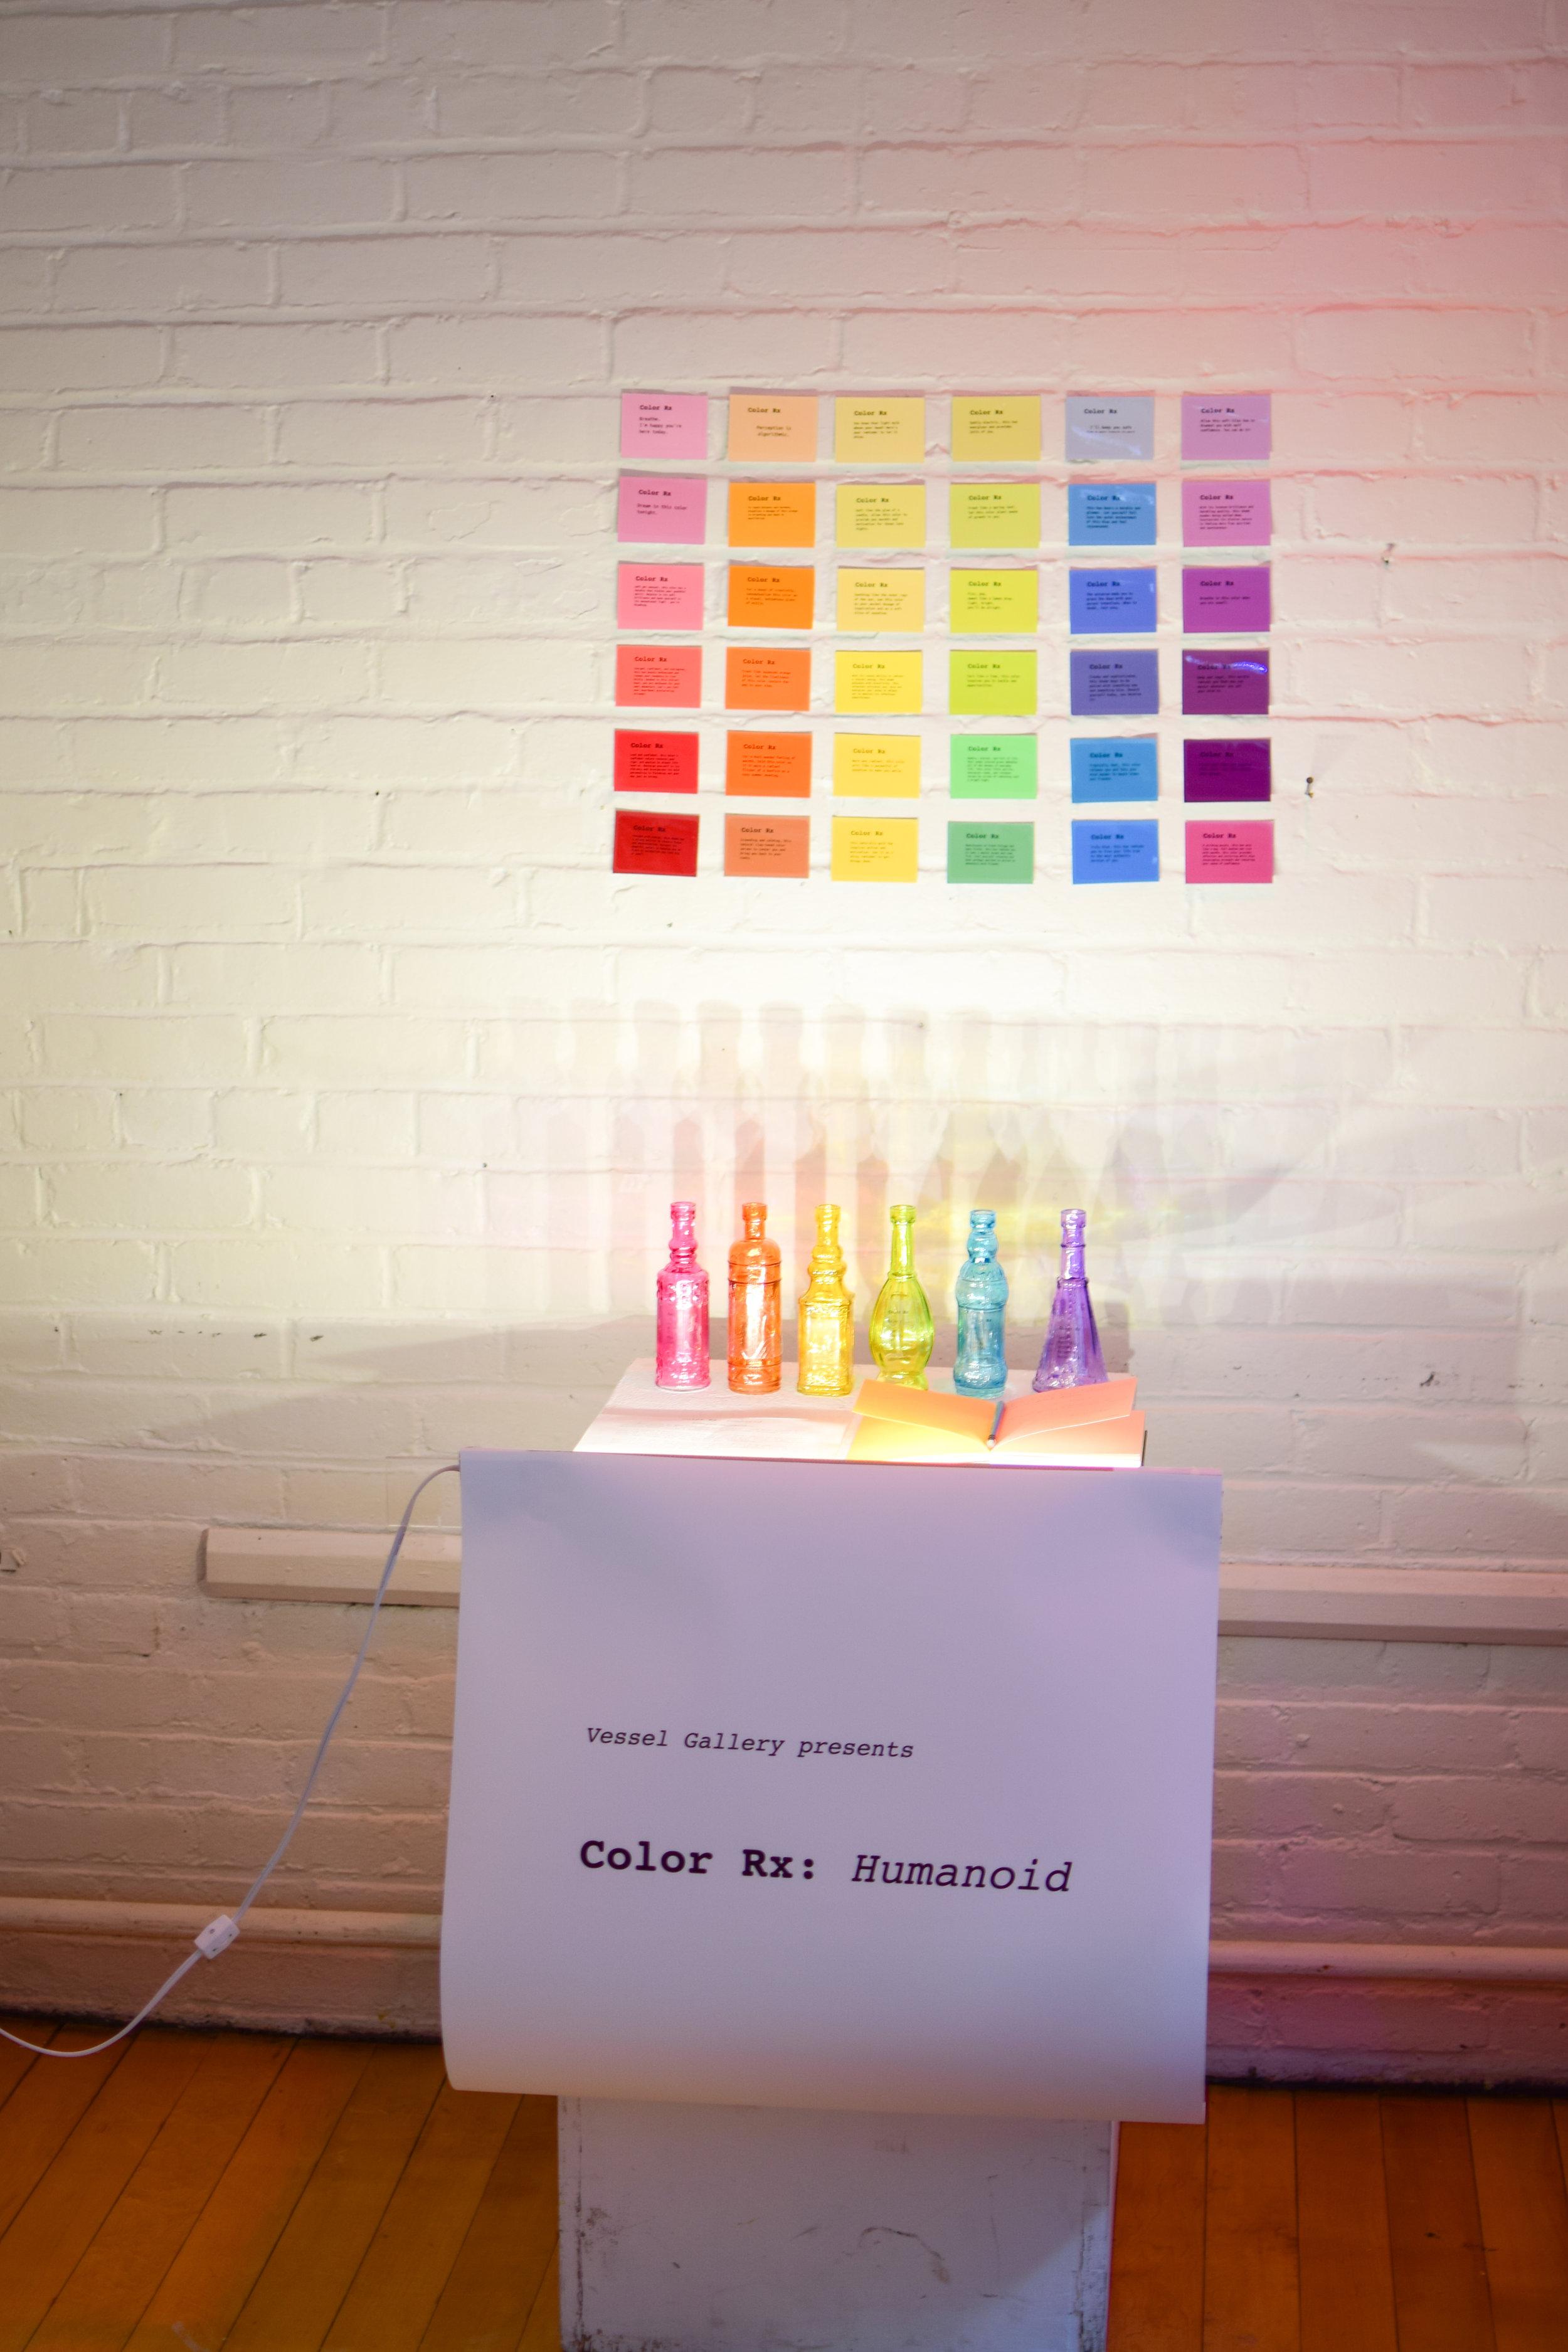 colorrx-0177.jpg